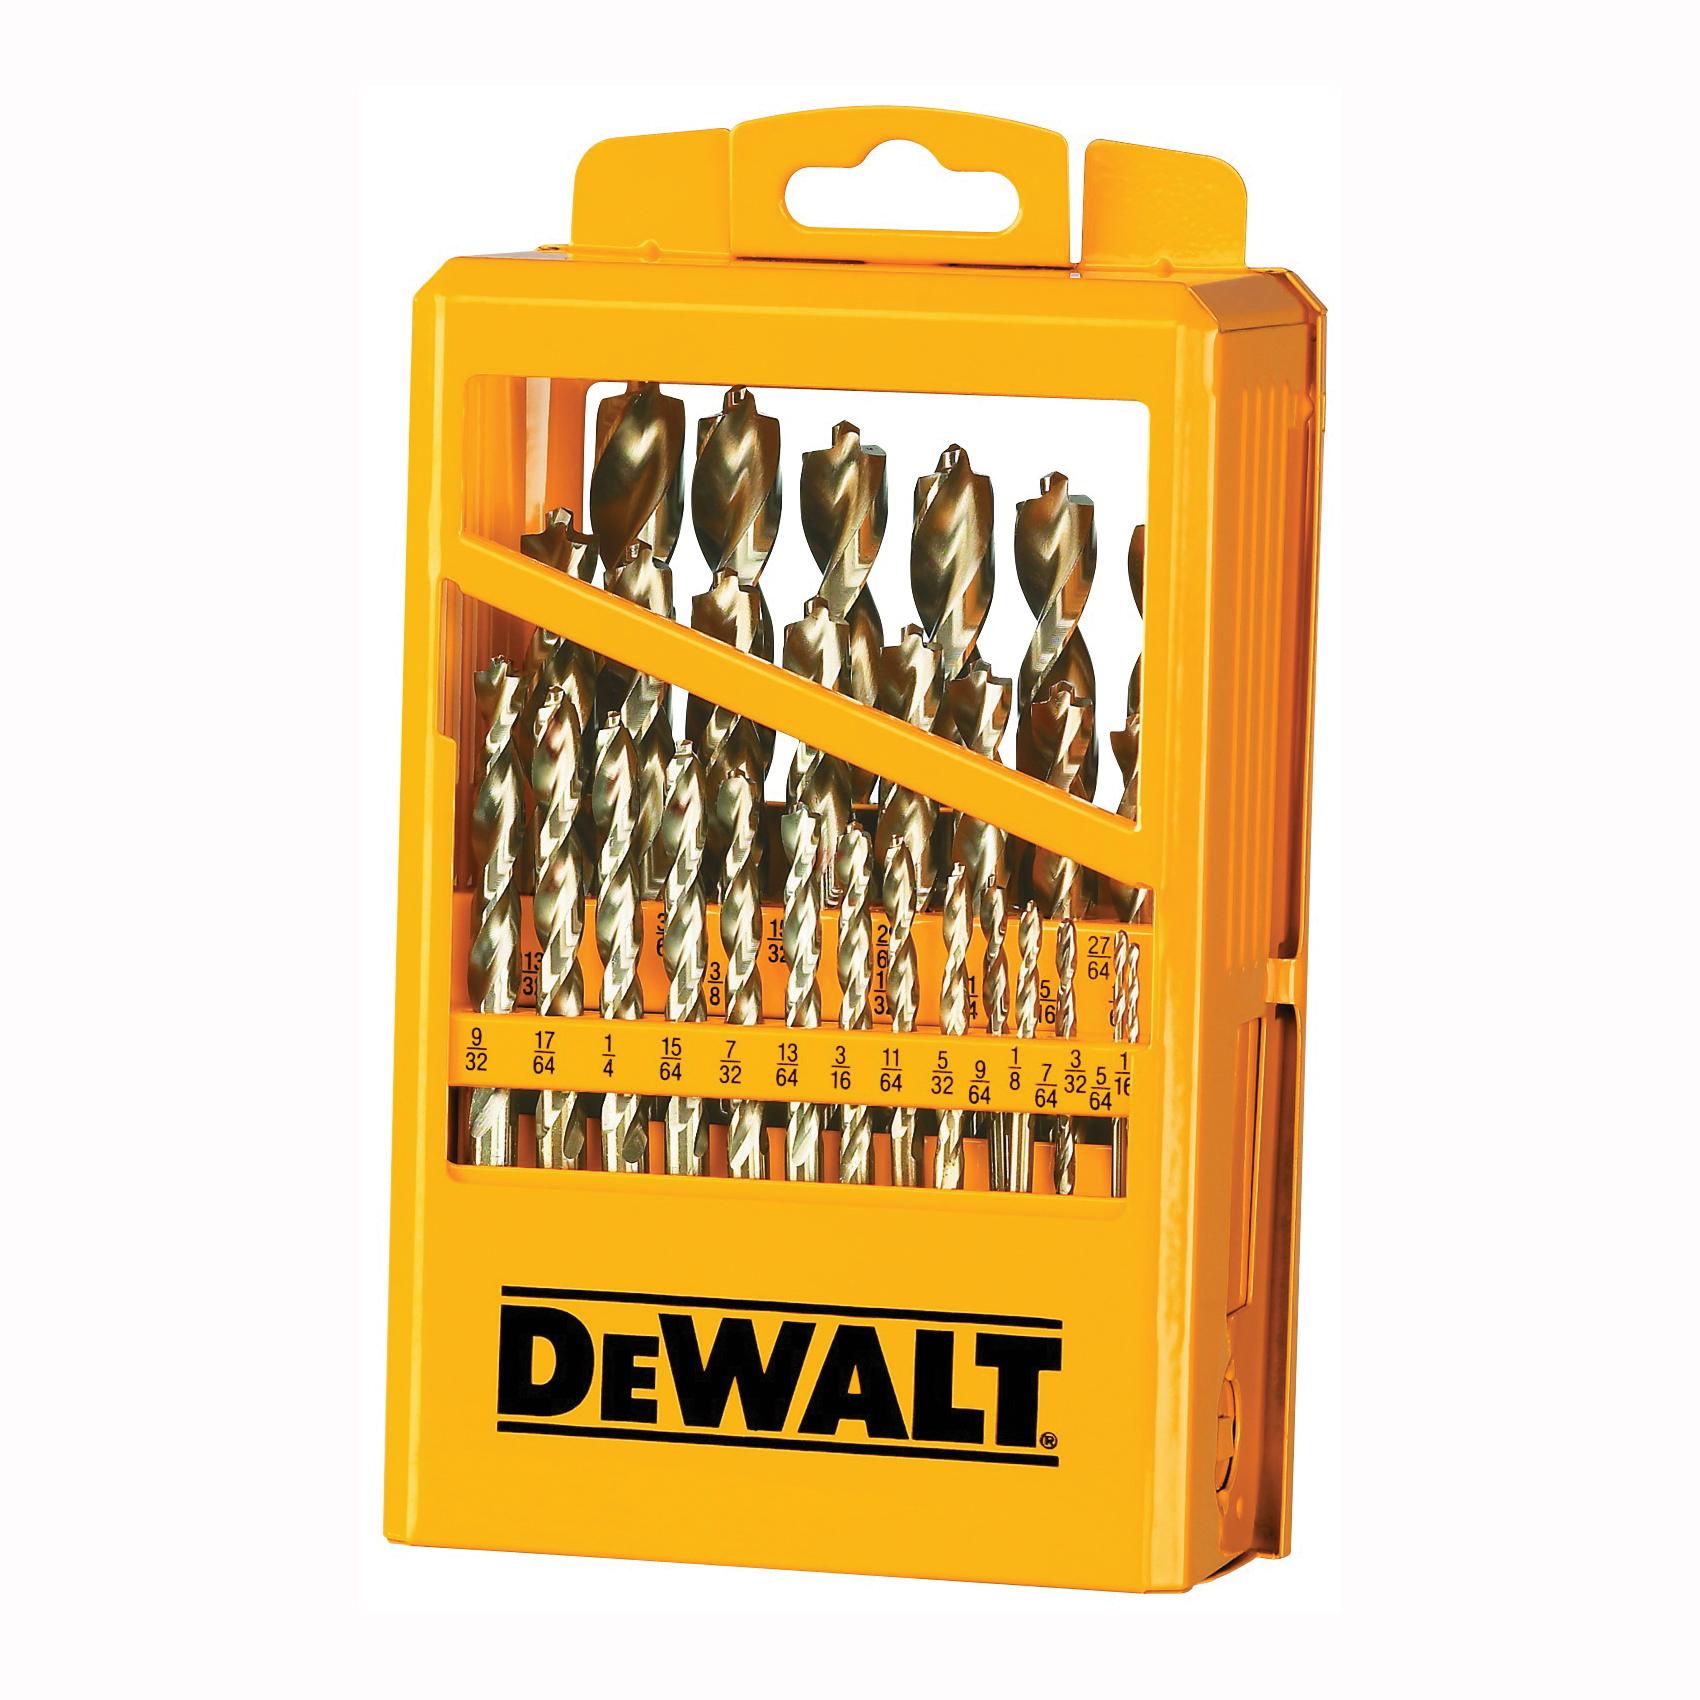 Picture of DeWALT DW1969 Drill Bit Set, High-Performance, 29 -Piece, Steel, Ferrous Oxide